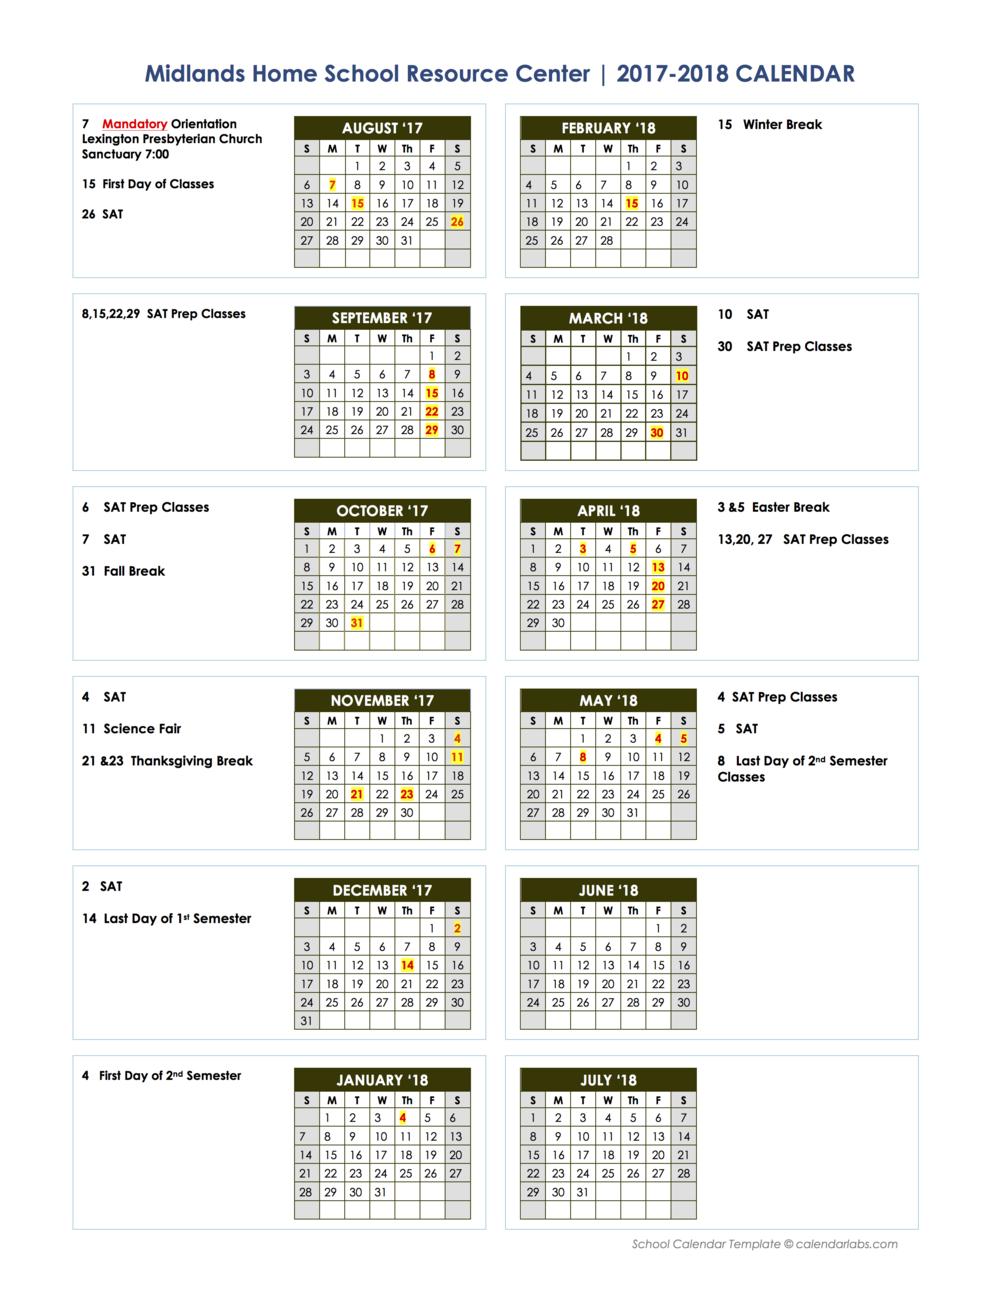 2017-2018 MHSRC Calendar.png